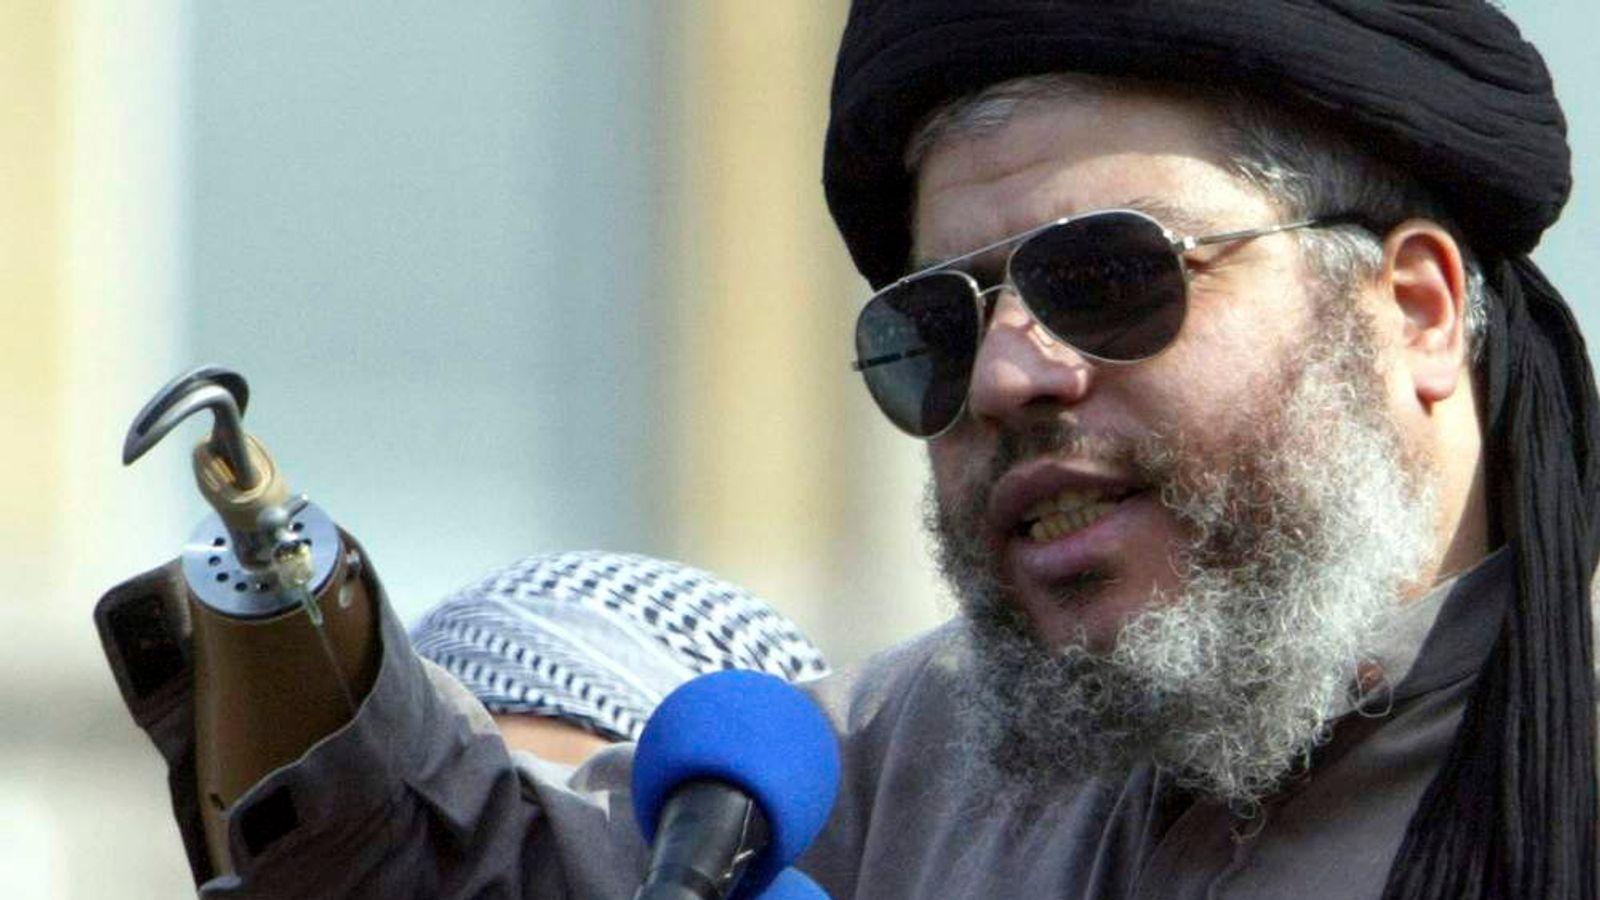 Muslim cleric, Abu Hamza al-Masri, is seen addressing the sixth annual rally for Islam in Trafalgar Square, London in this August 25, 2002.